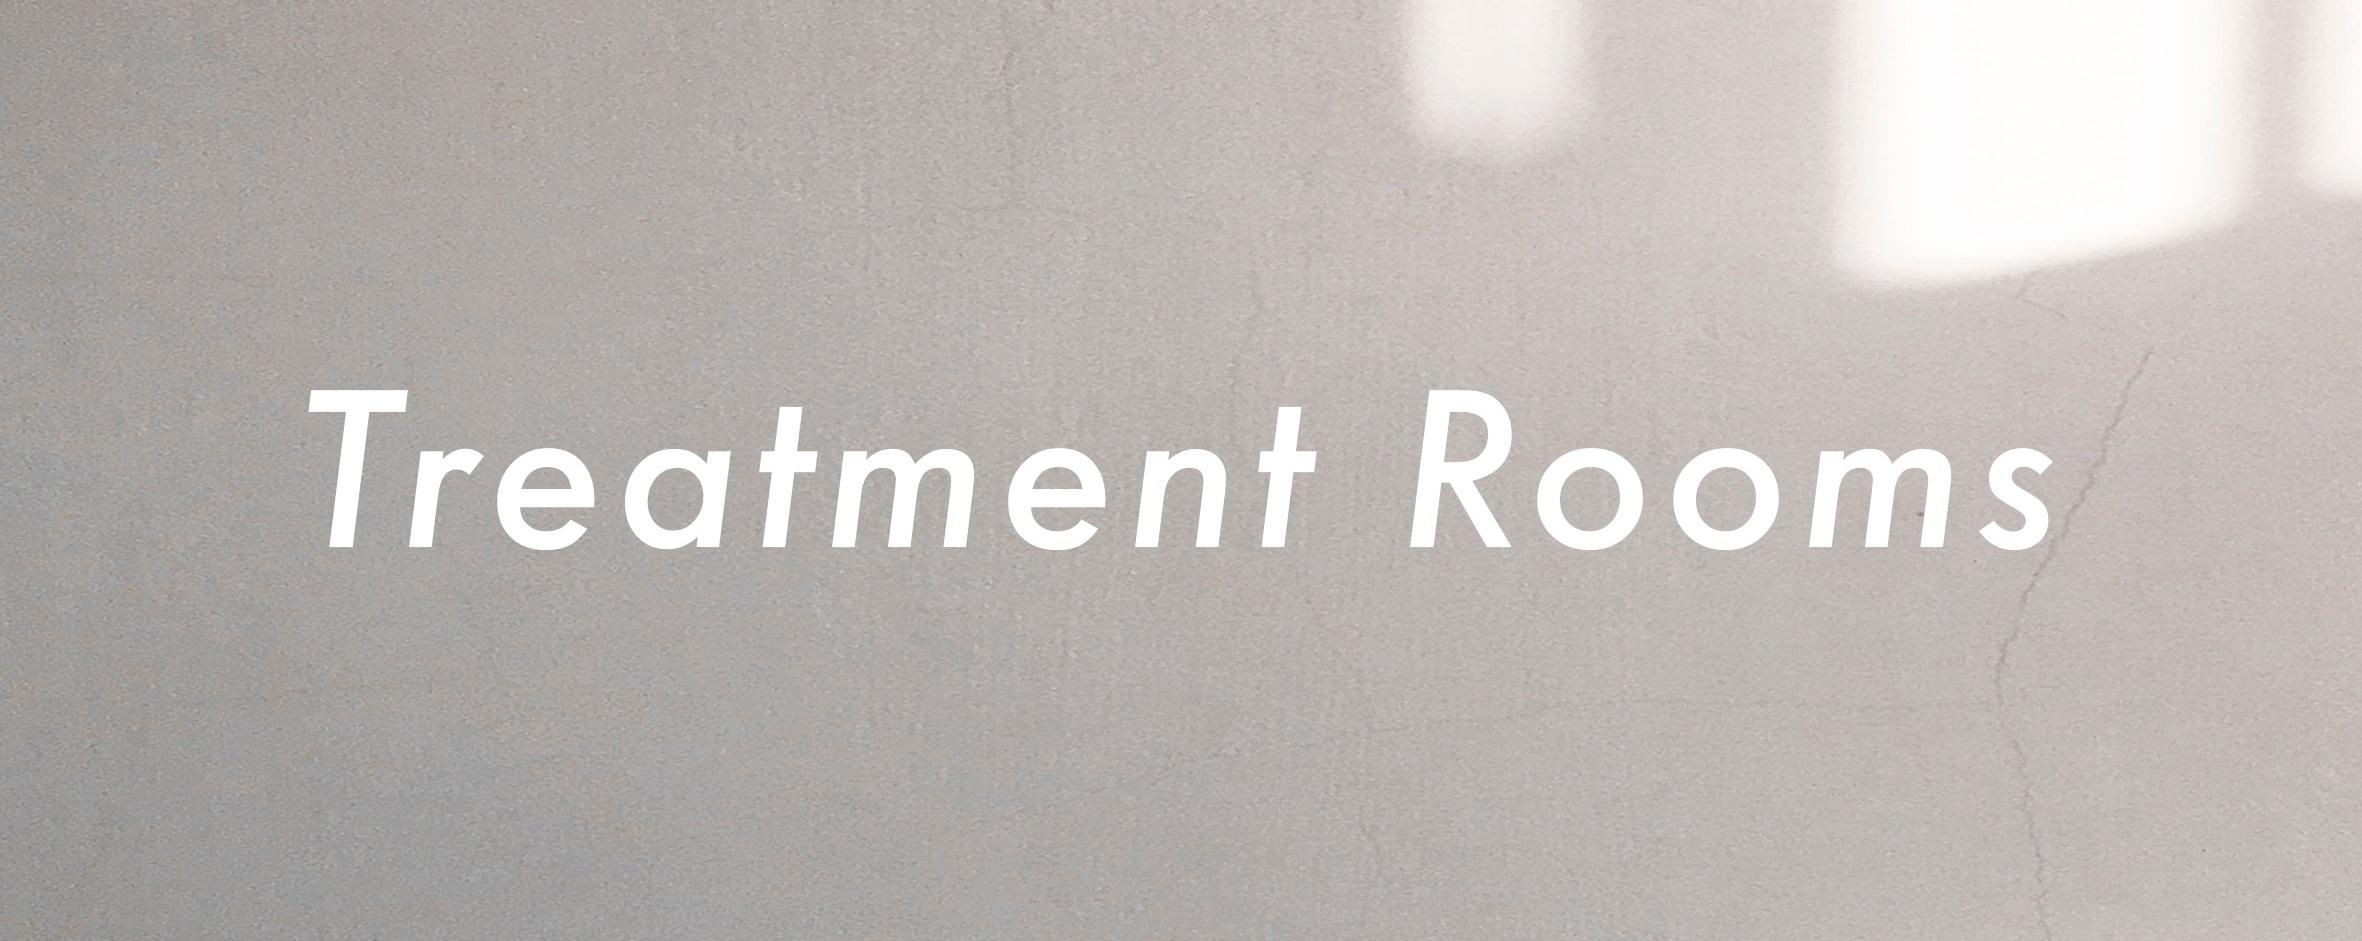 Treatment+Rooms+web+banner.jpg